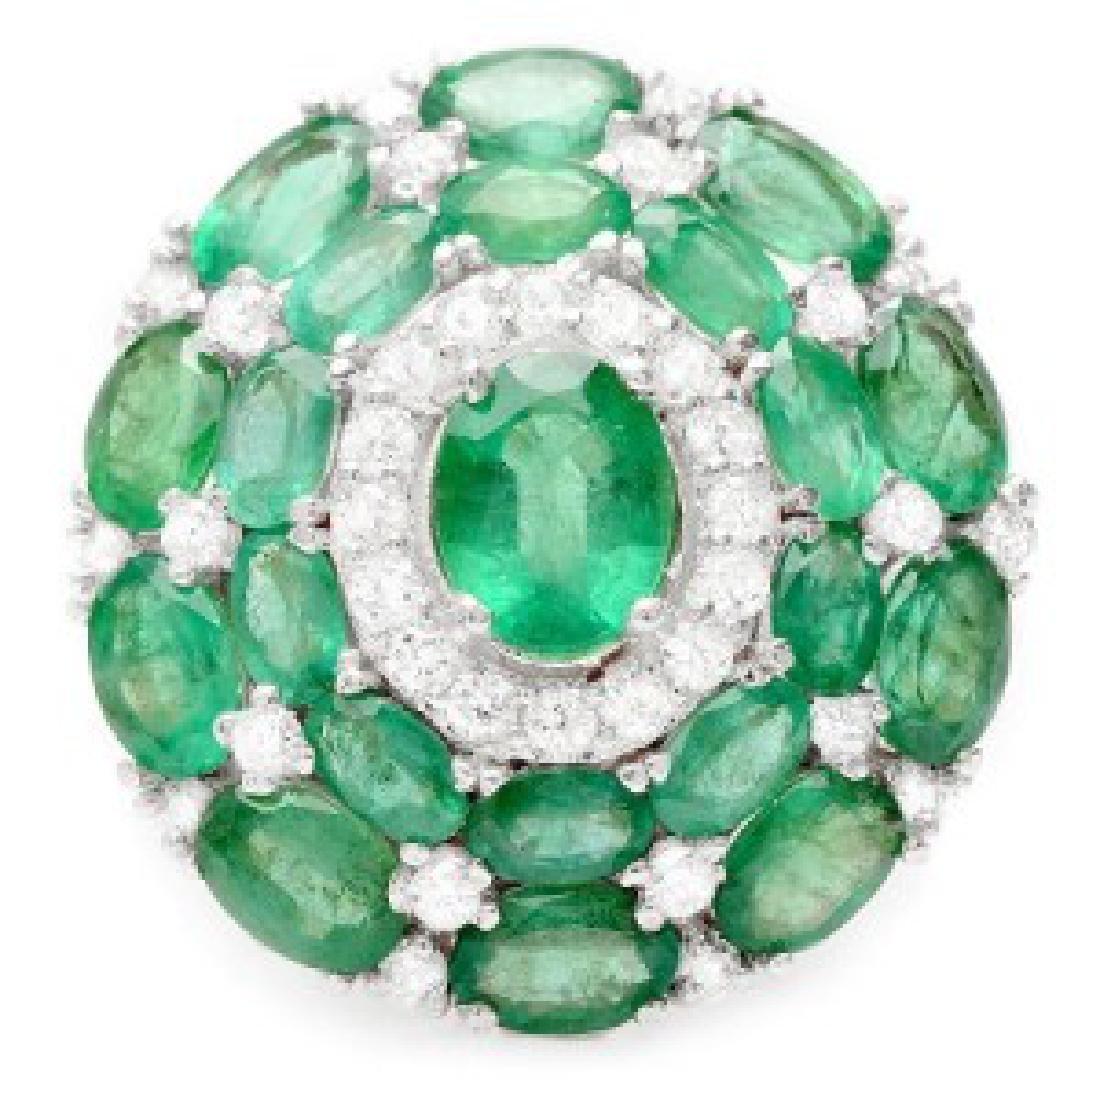 8.89 Carat Natural Emerald 18K Solid White Gold Diamond - 2